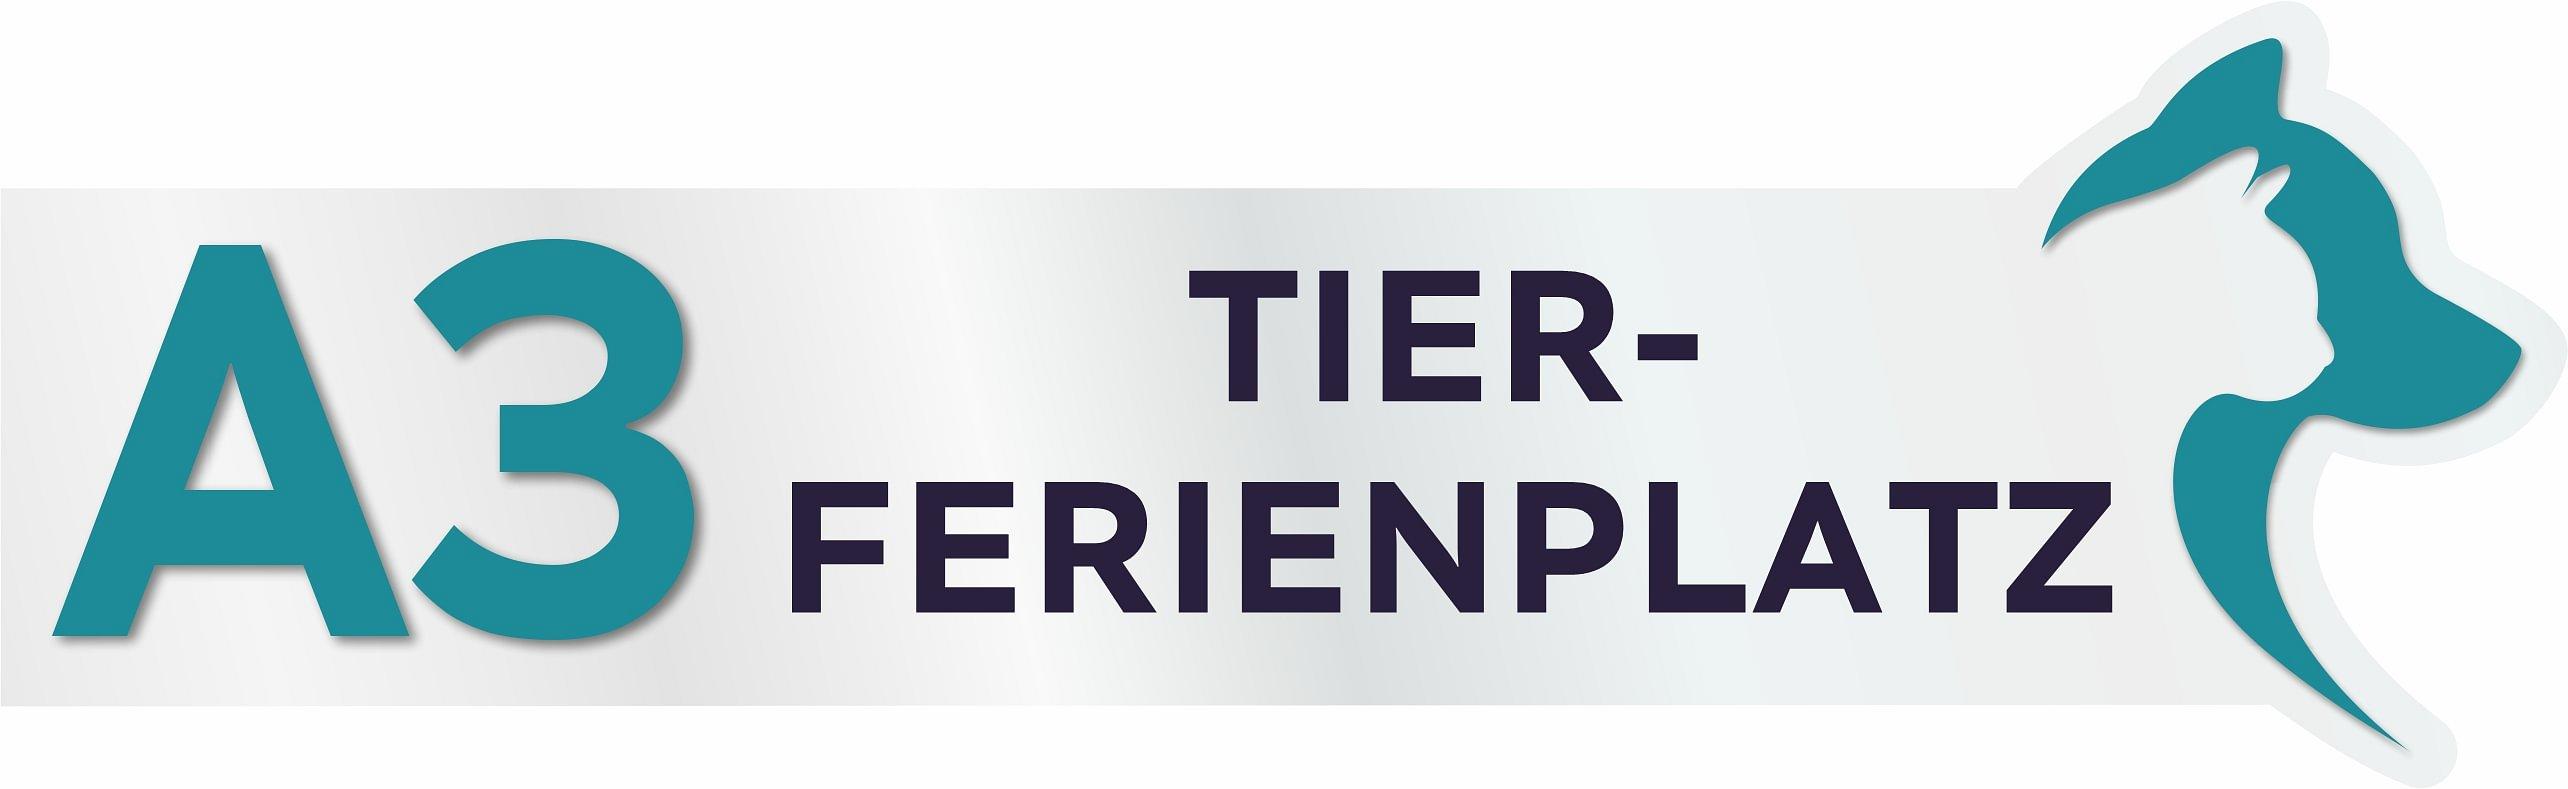 A3-Tierferienplatz Scherer